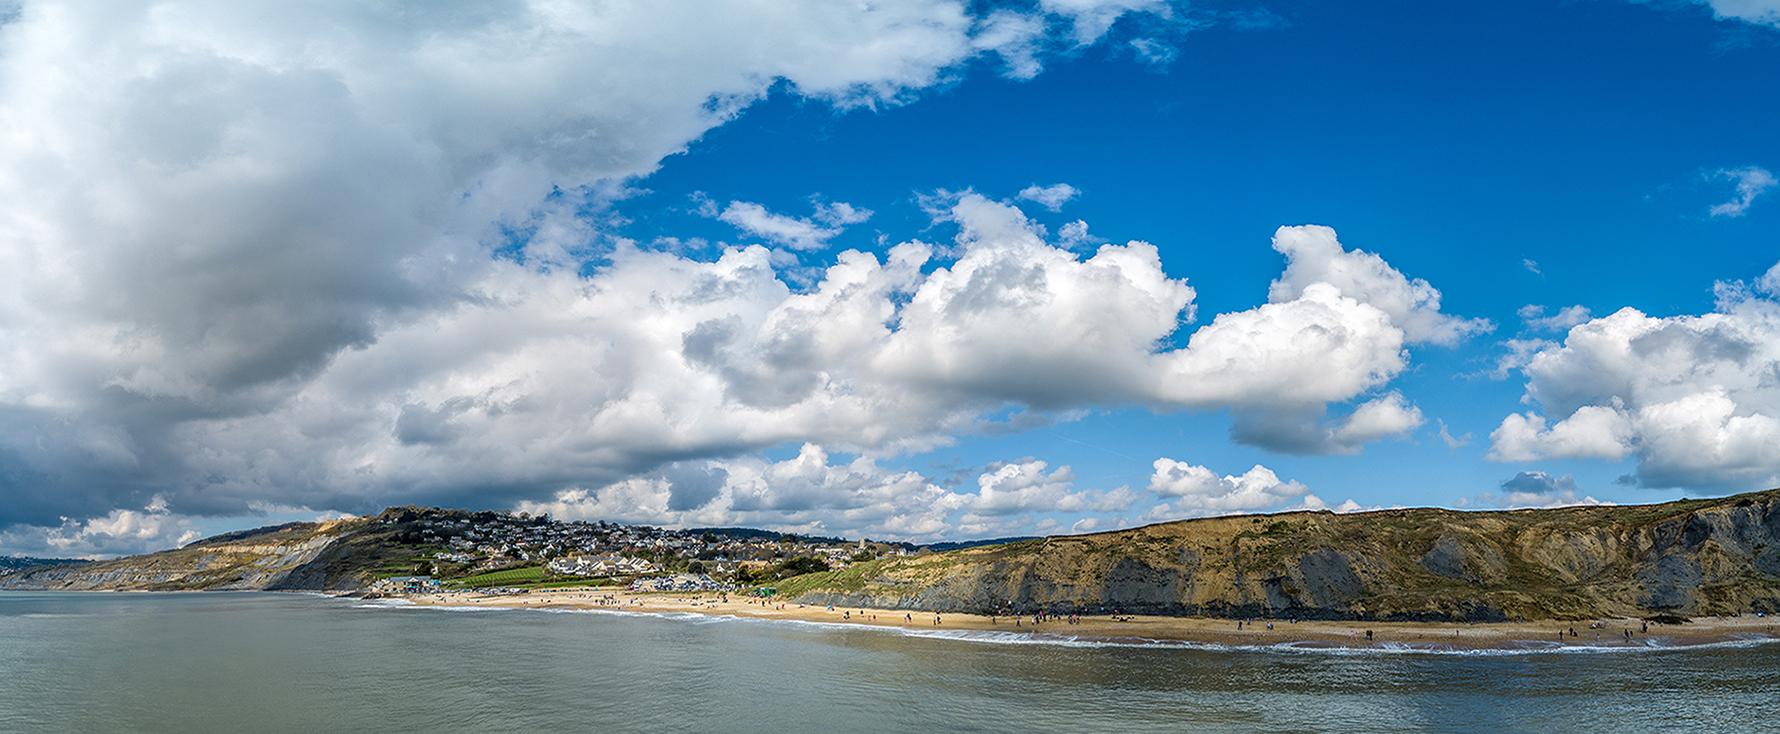 Dorset Coastline 02 - small.jpg